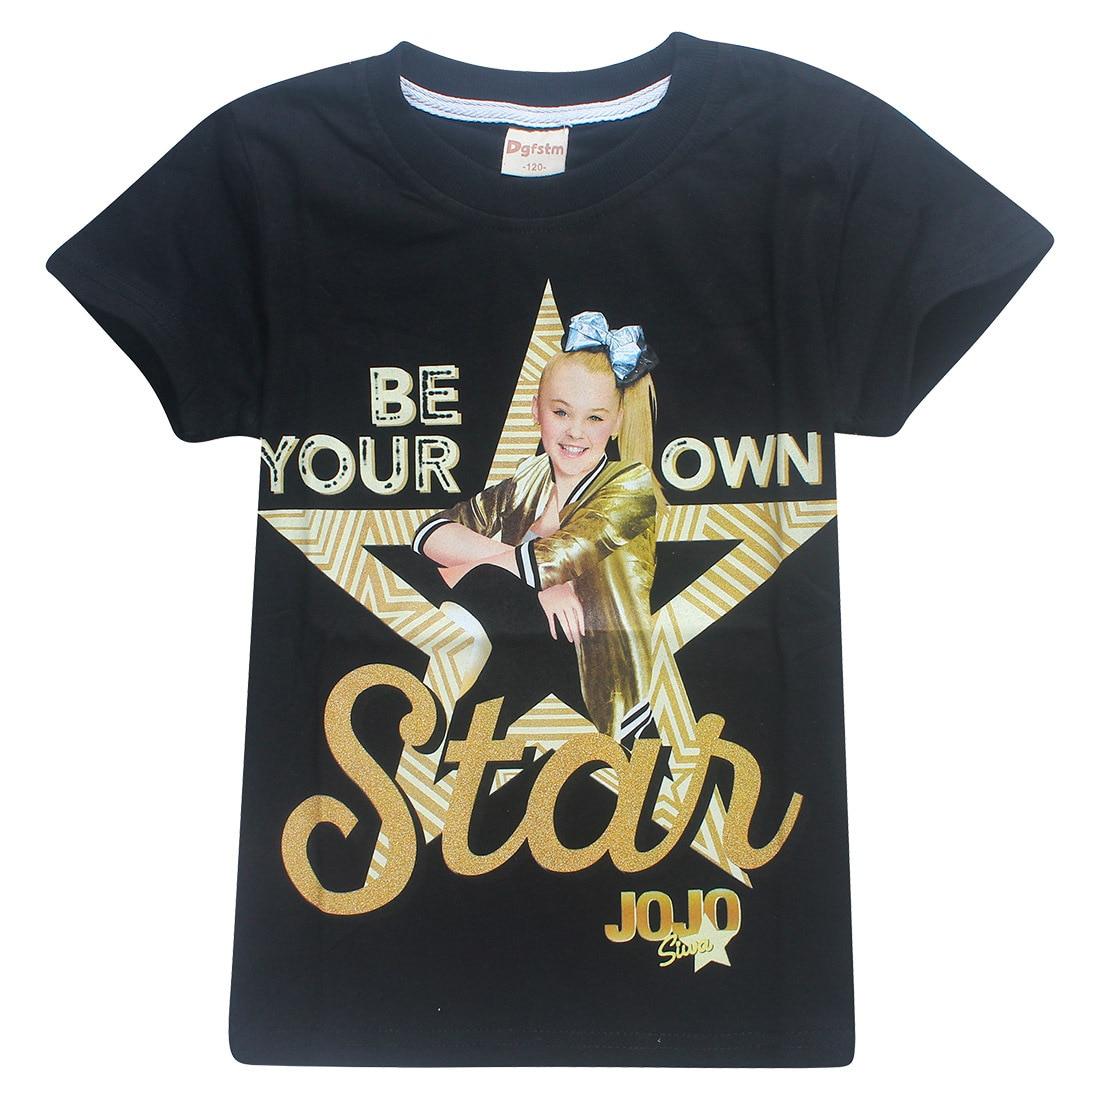 2018 New Summer Jojo Siwa Shirts Baby Girls Tshirts Short Sleeve T Shirts for Kids Bobo Choses T-shirt Child Sport Clothes 4-12Y new 2015 summer children t shirts baby clothes child 100